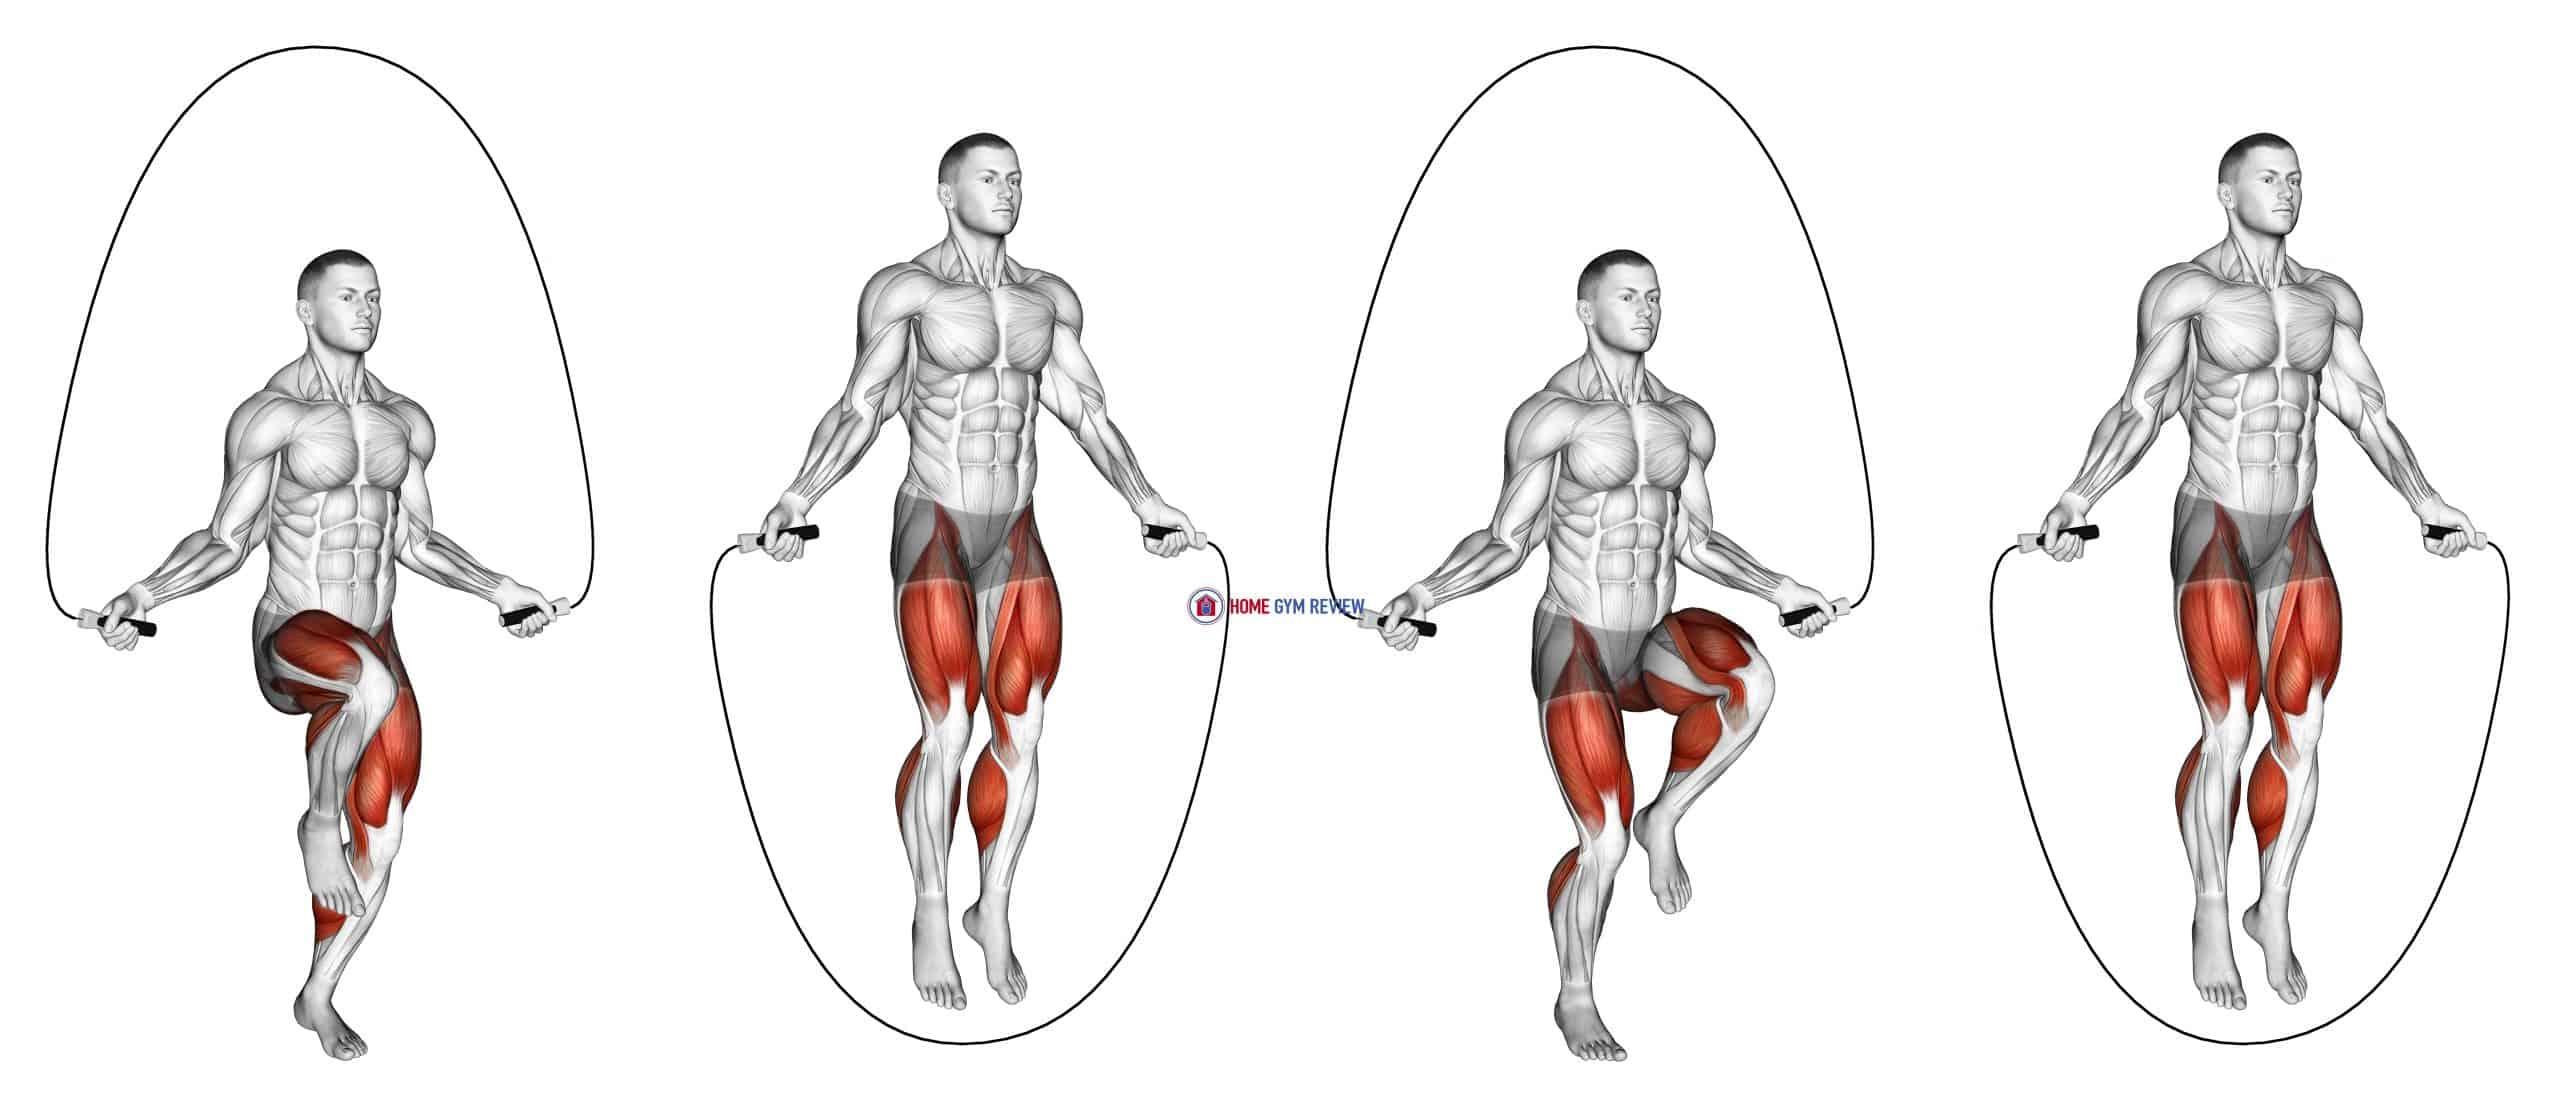 High Knee Jump Rope (male)